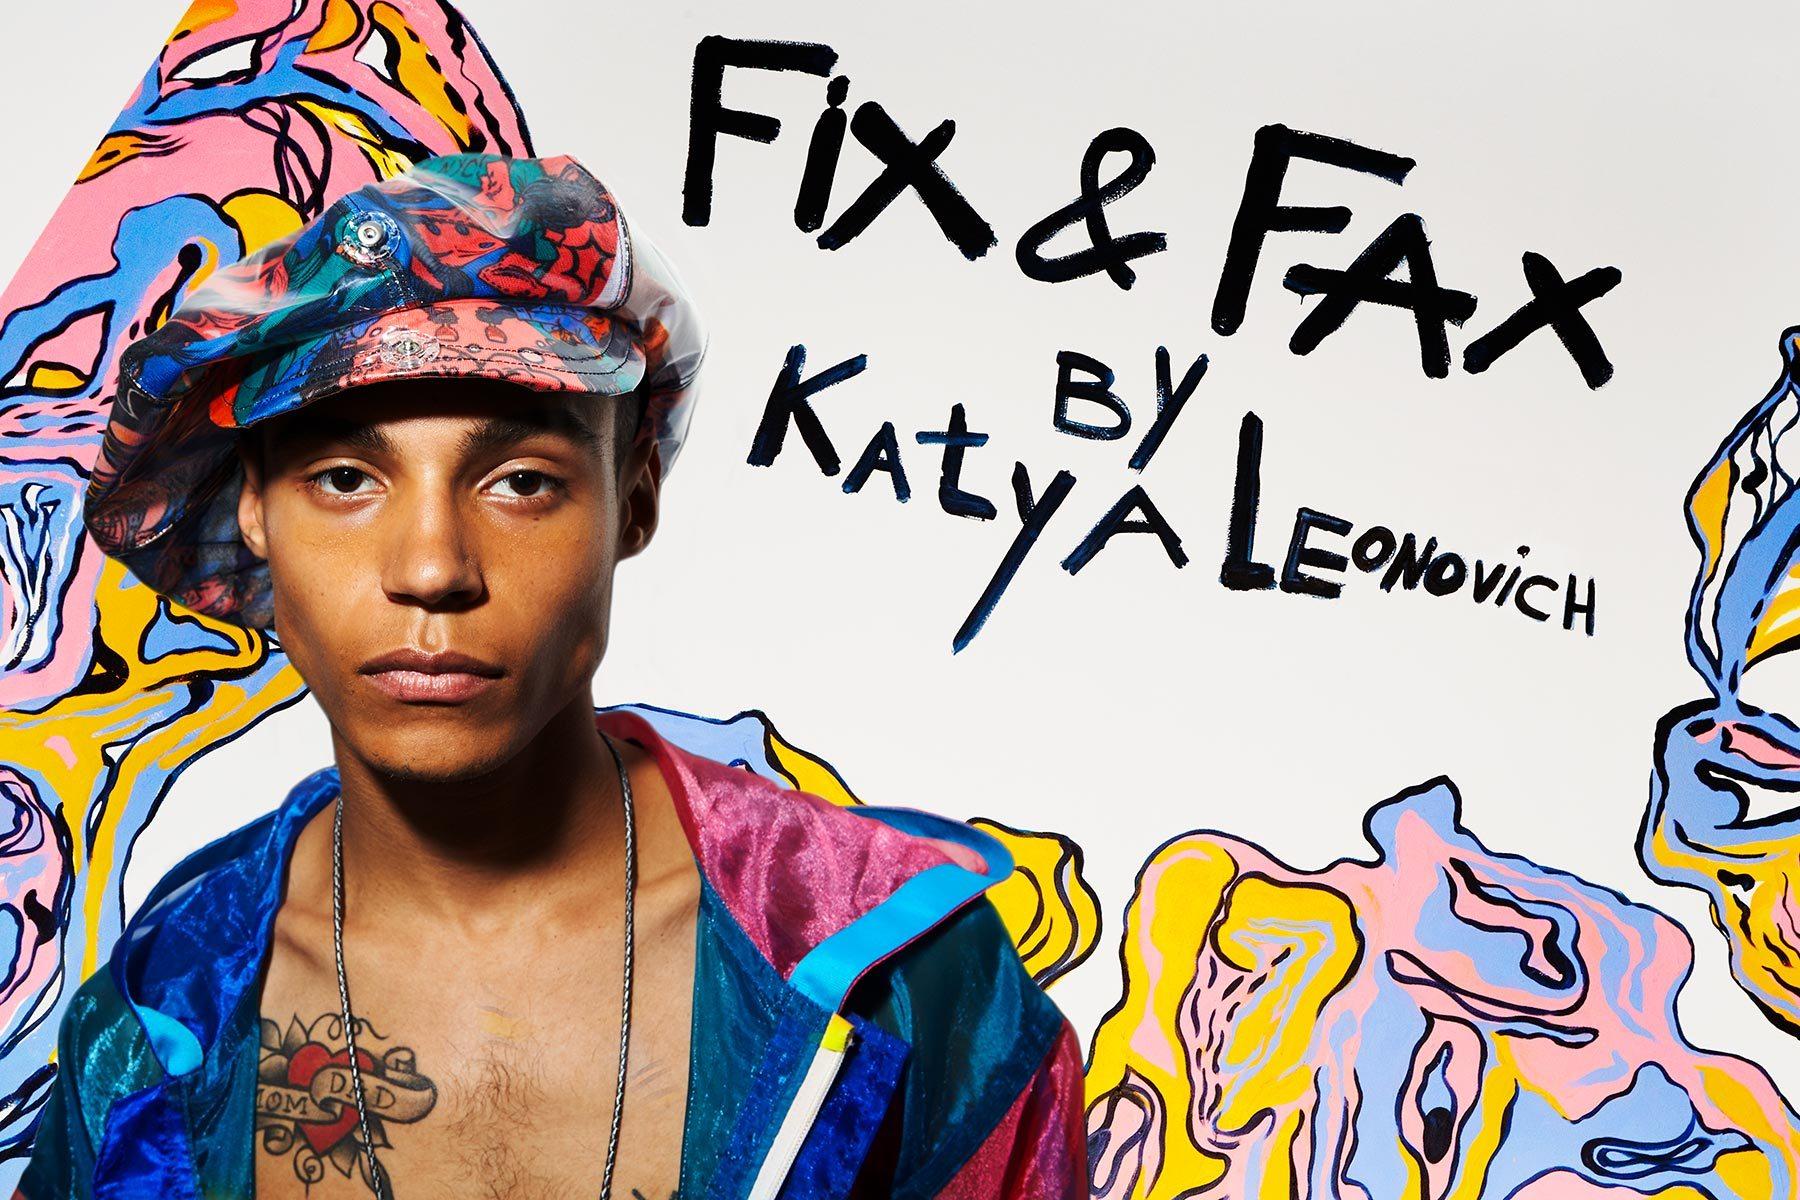 Fix & Fax by Katya Leonovich. Spring 2020. Photography by Alexander Thompson for Ponyboy magazine.